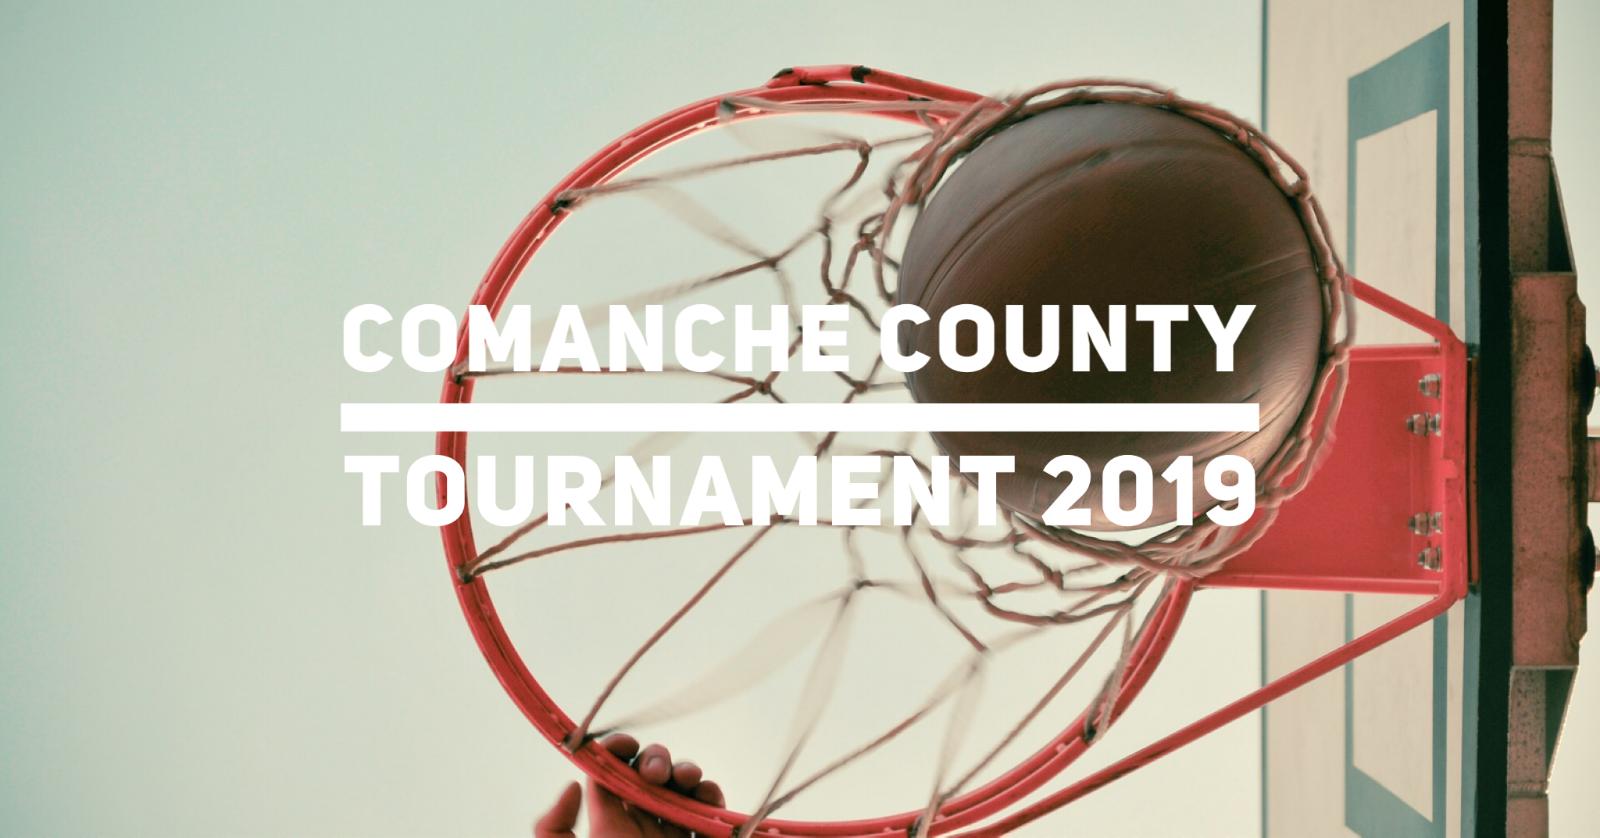 Comanche County Tournament Brackets Released